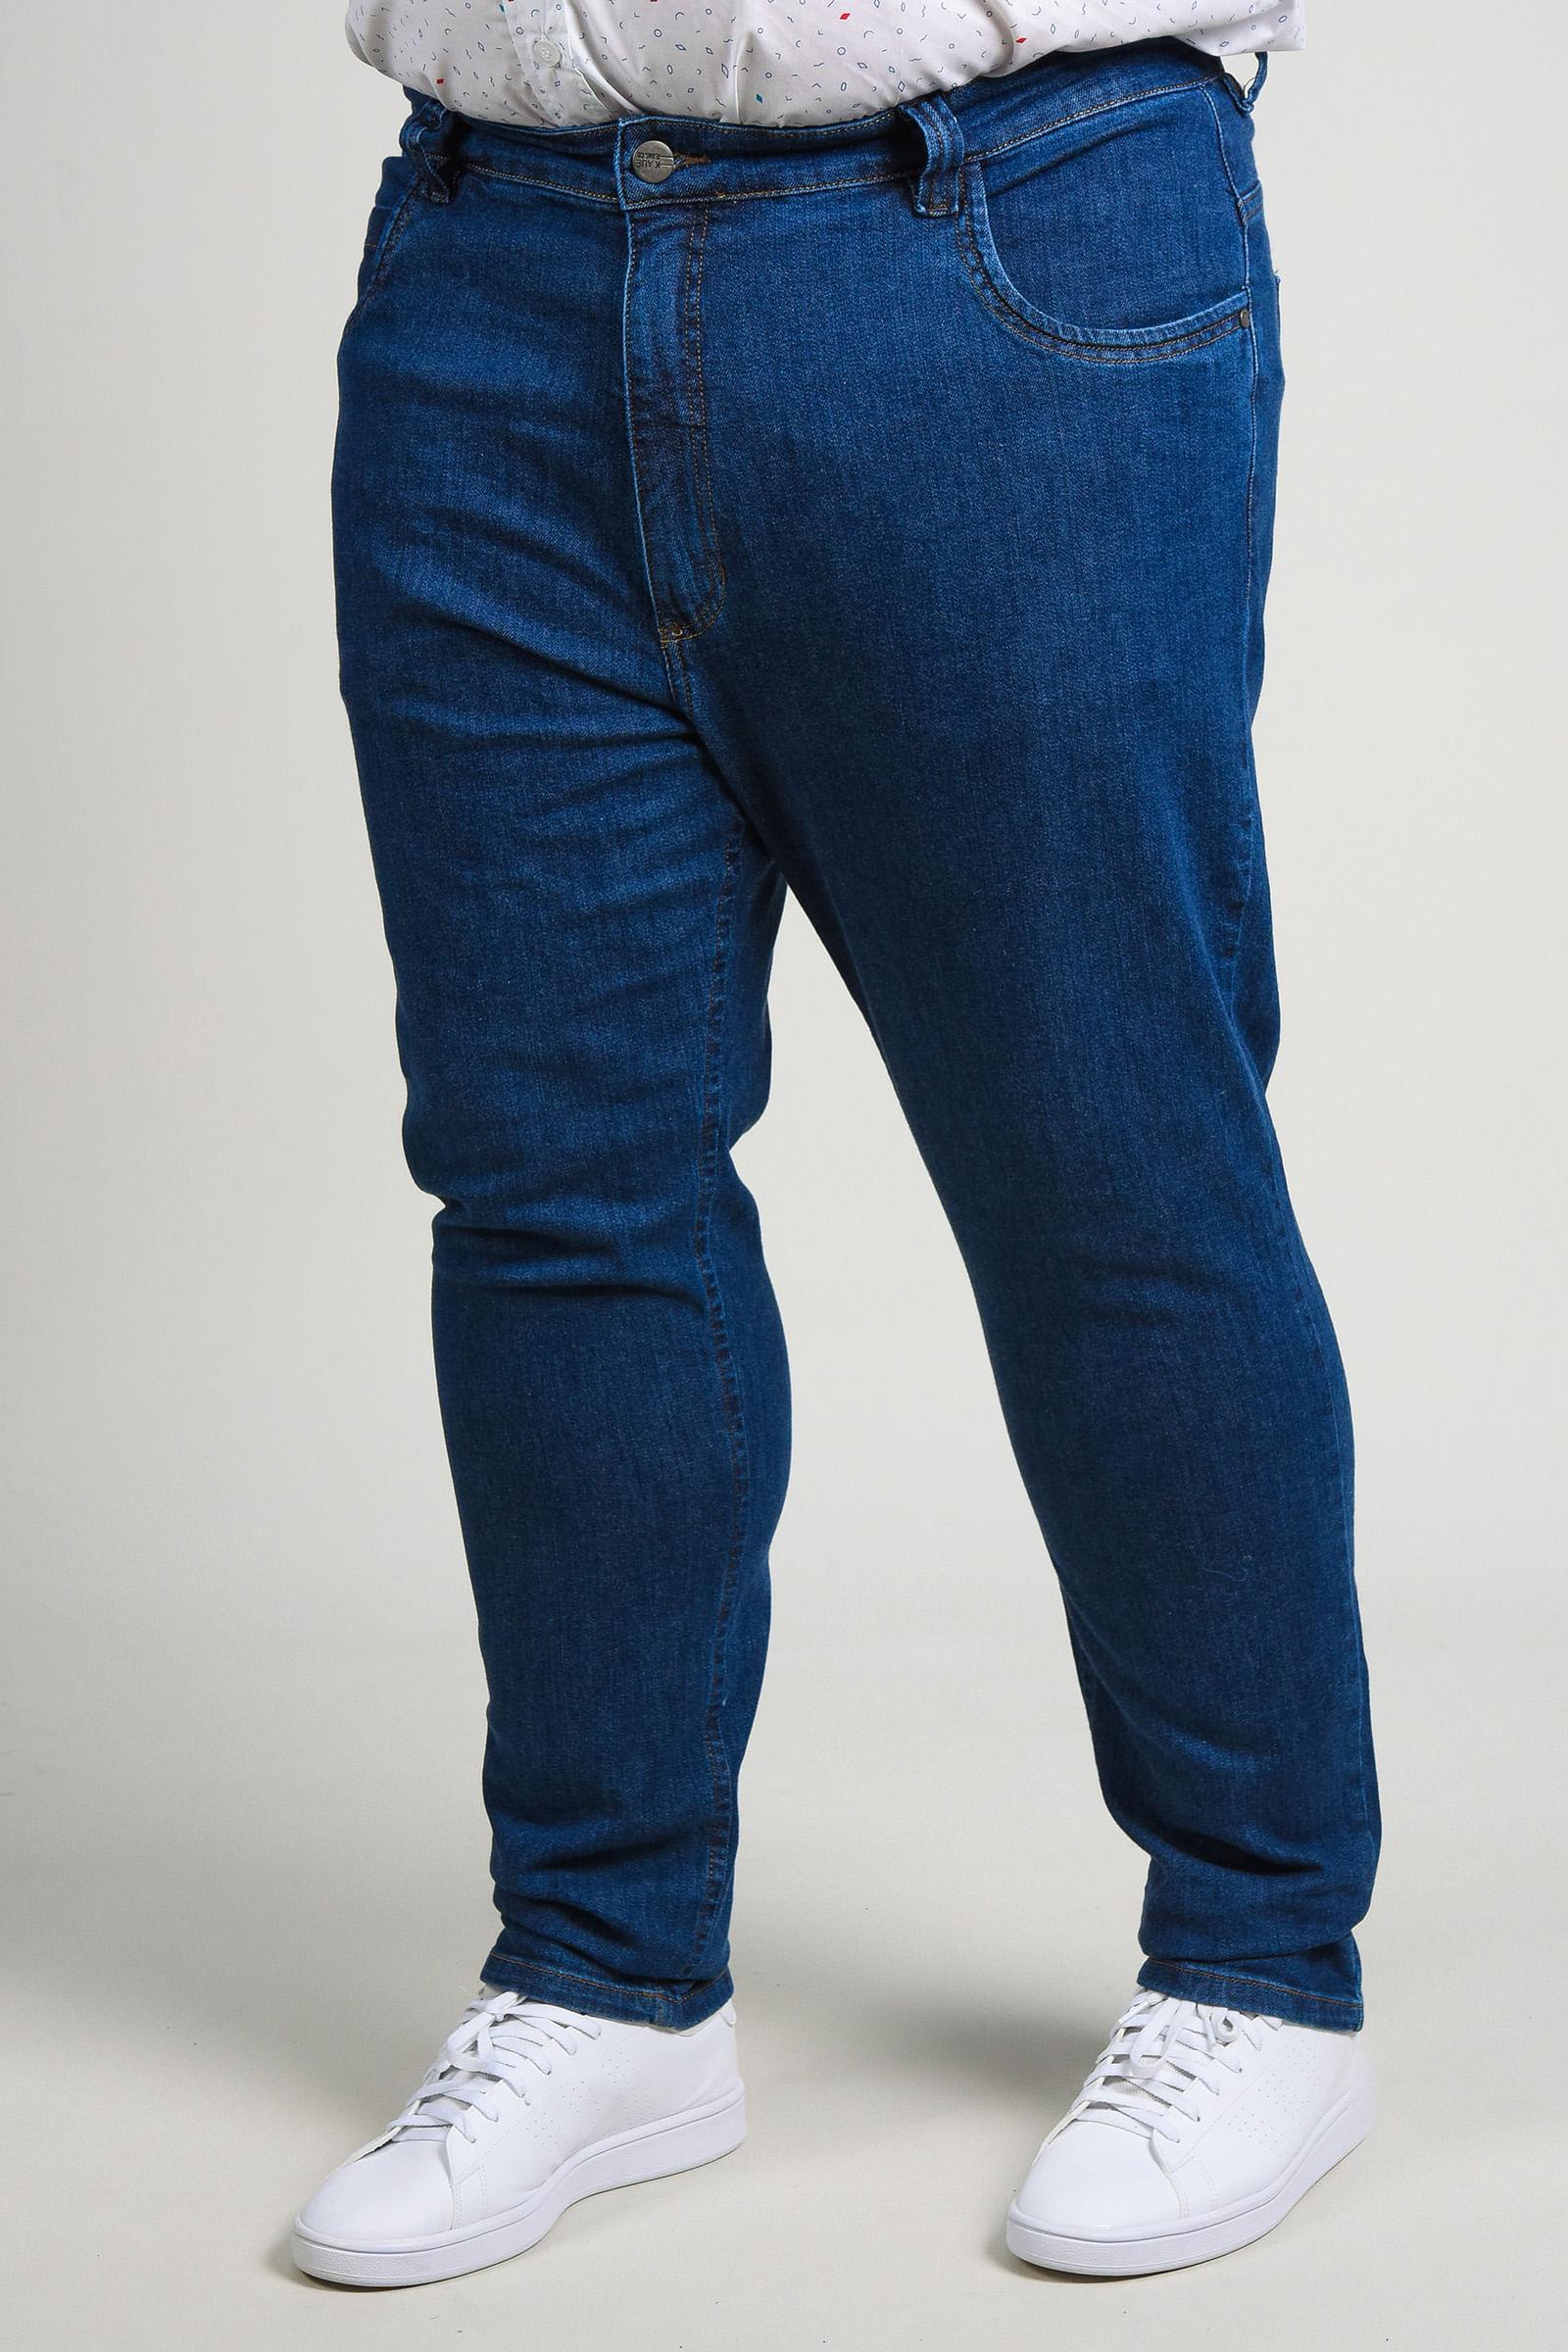 Calça skinny jeans blue plus size jeans blue